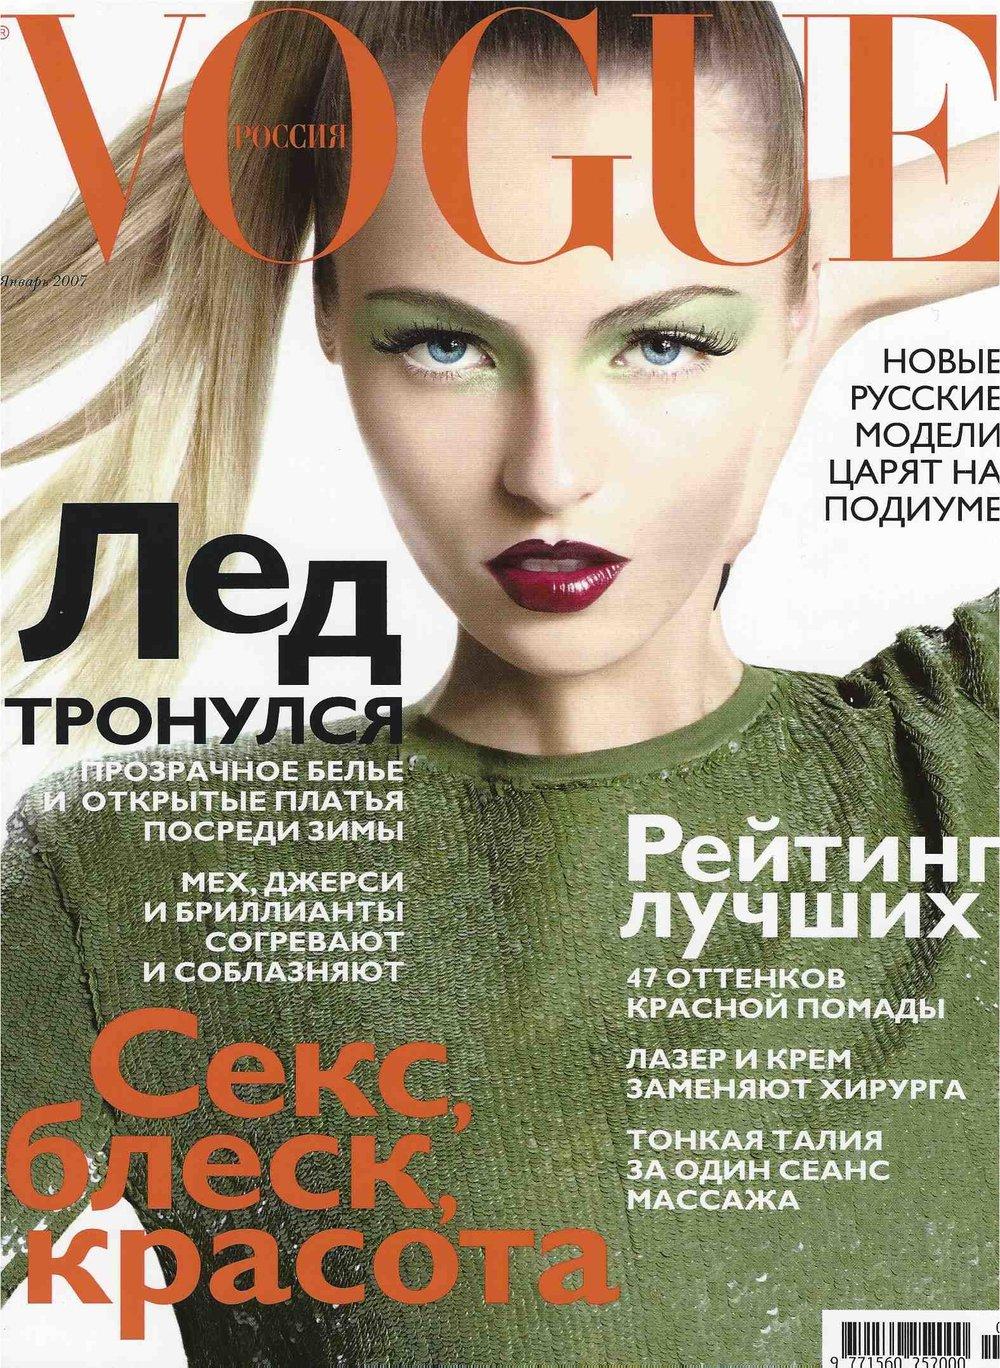 Lee Broomfield - Russian Vogue Cover copy.jpg